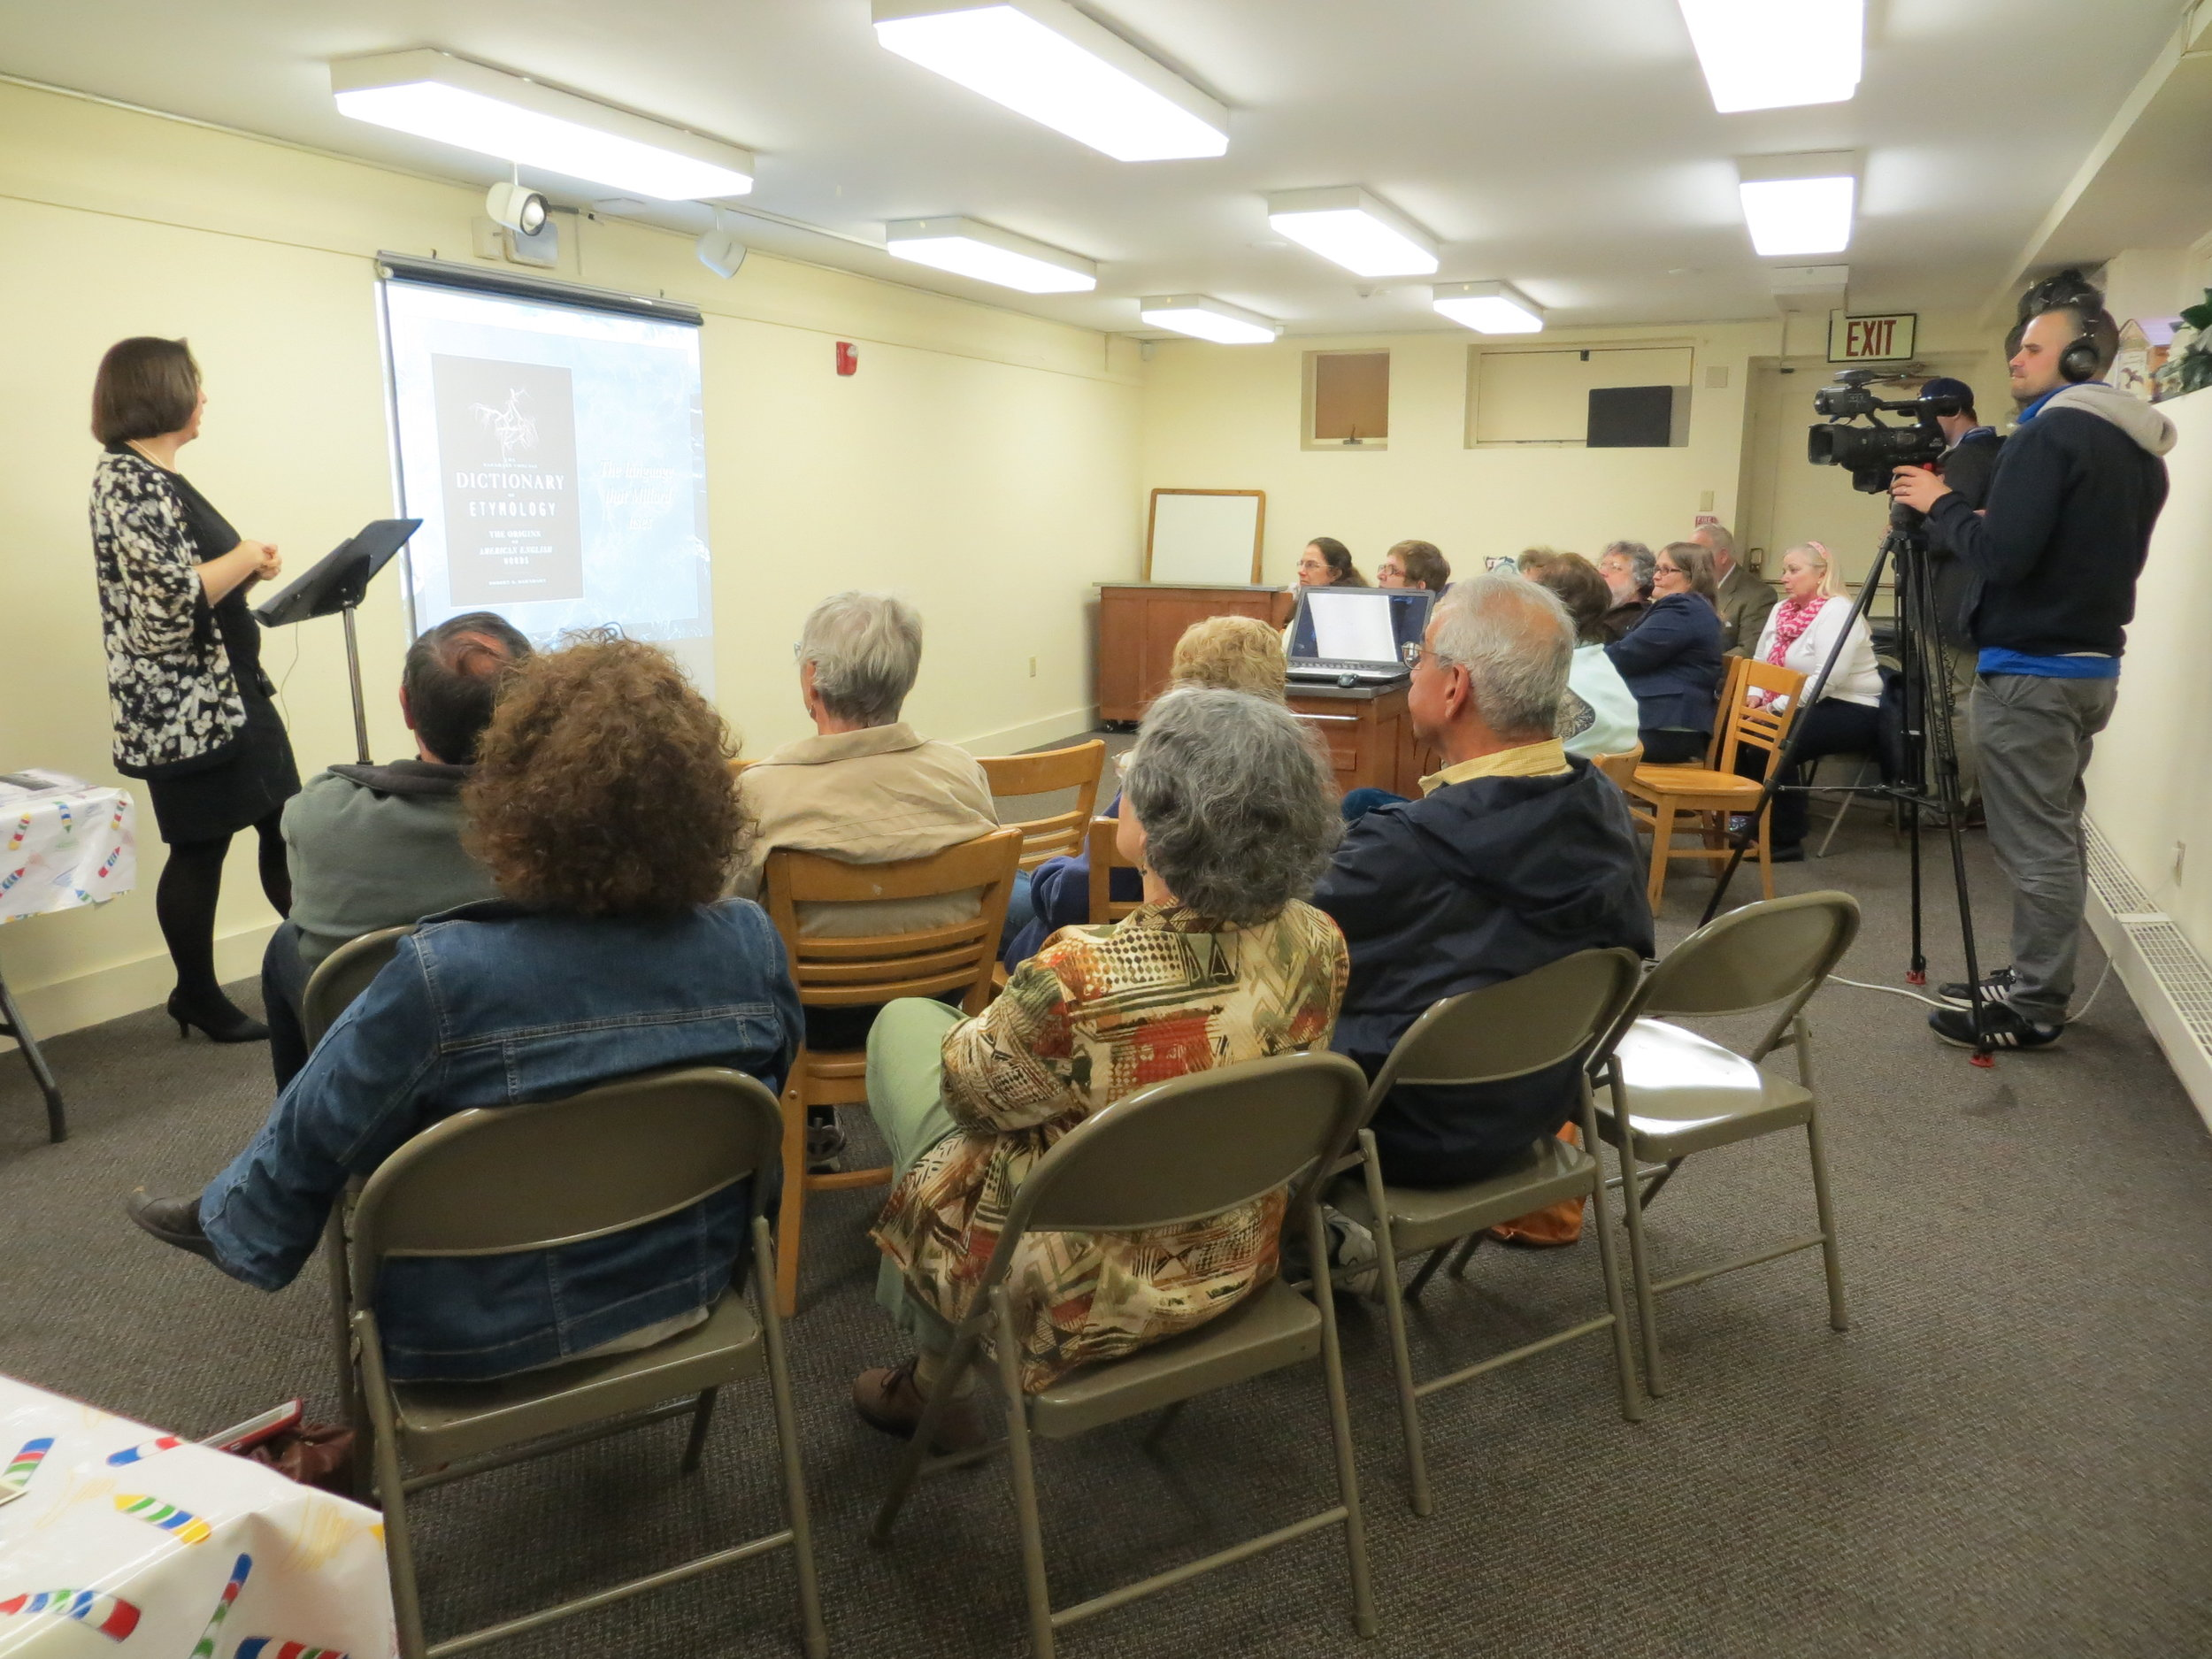 Presentation at the Richards Memorial Library, North Attleboro, MA, April 20, 2017